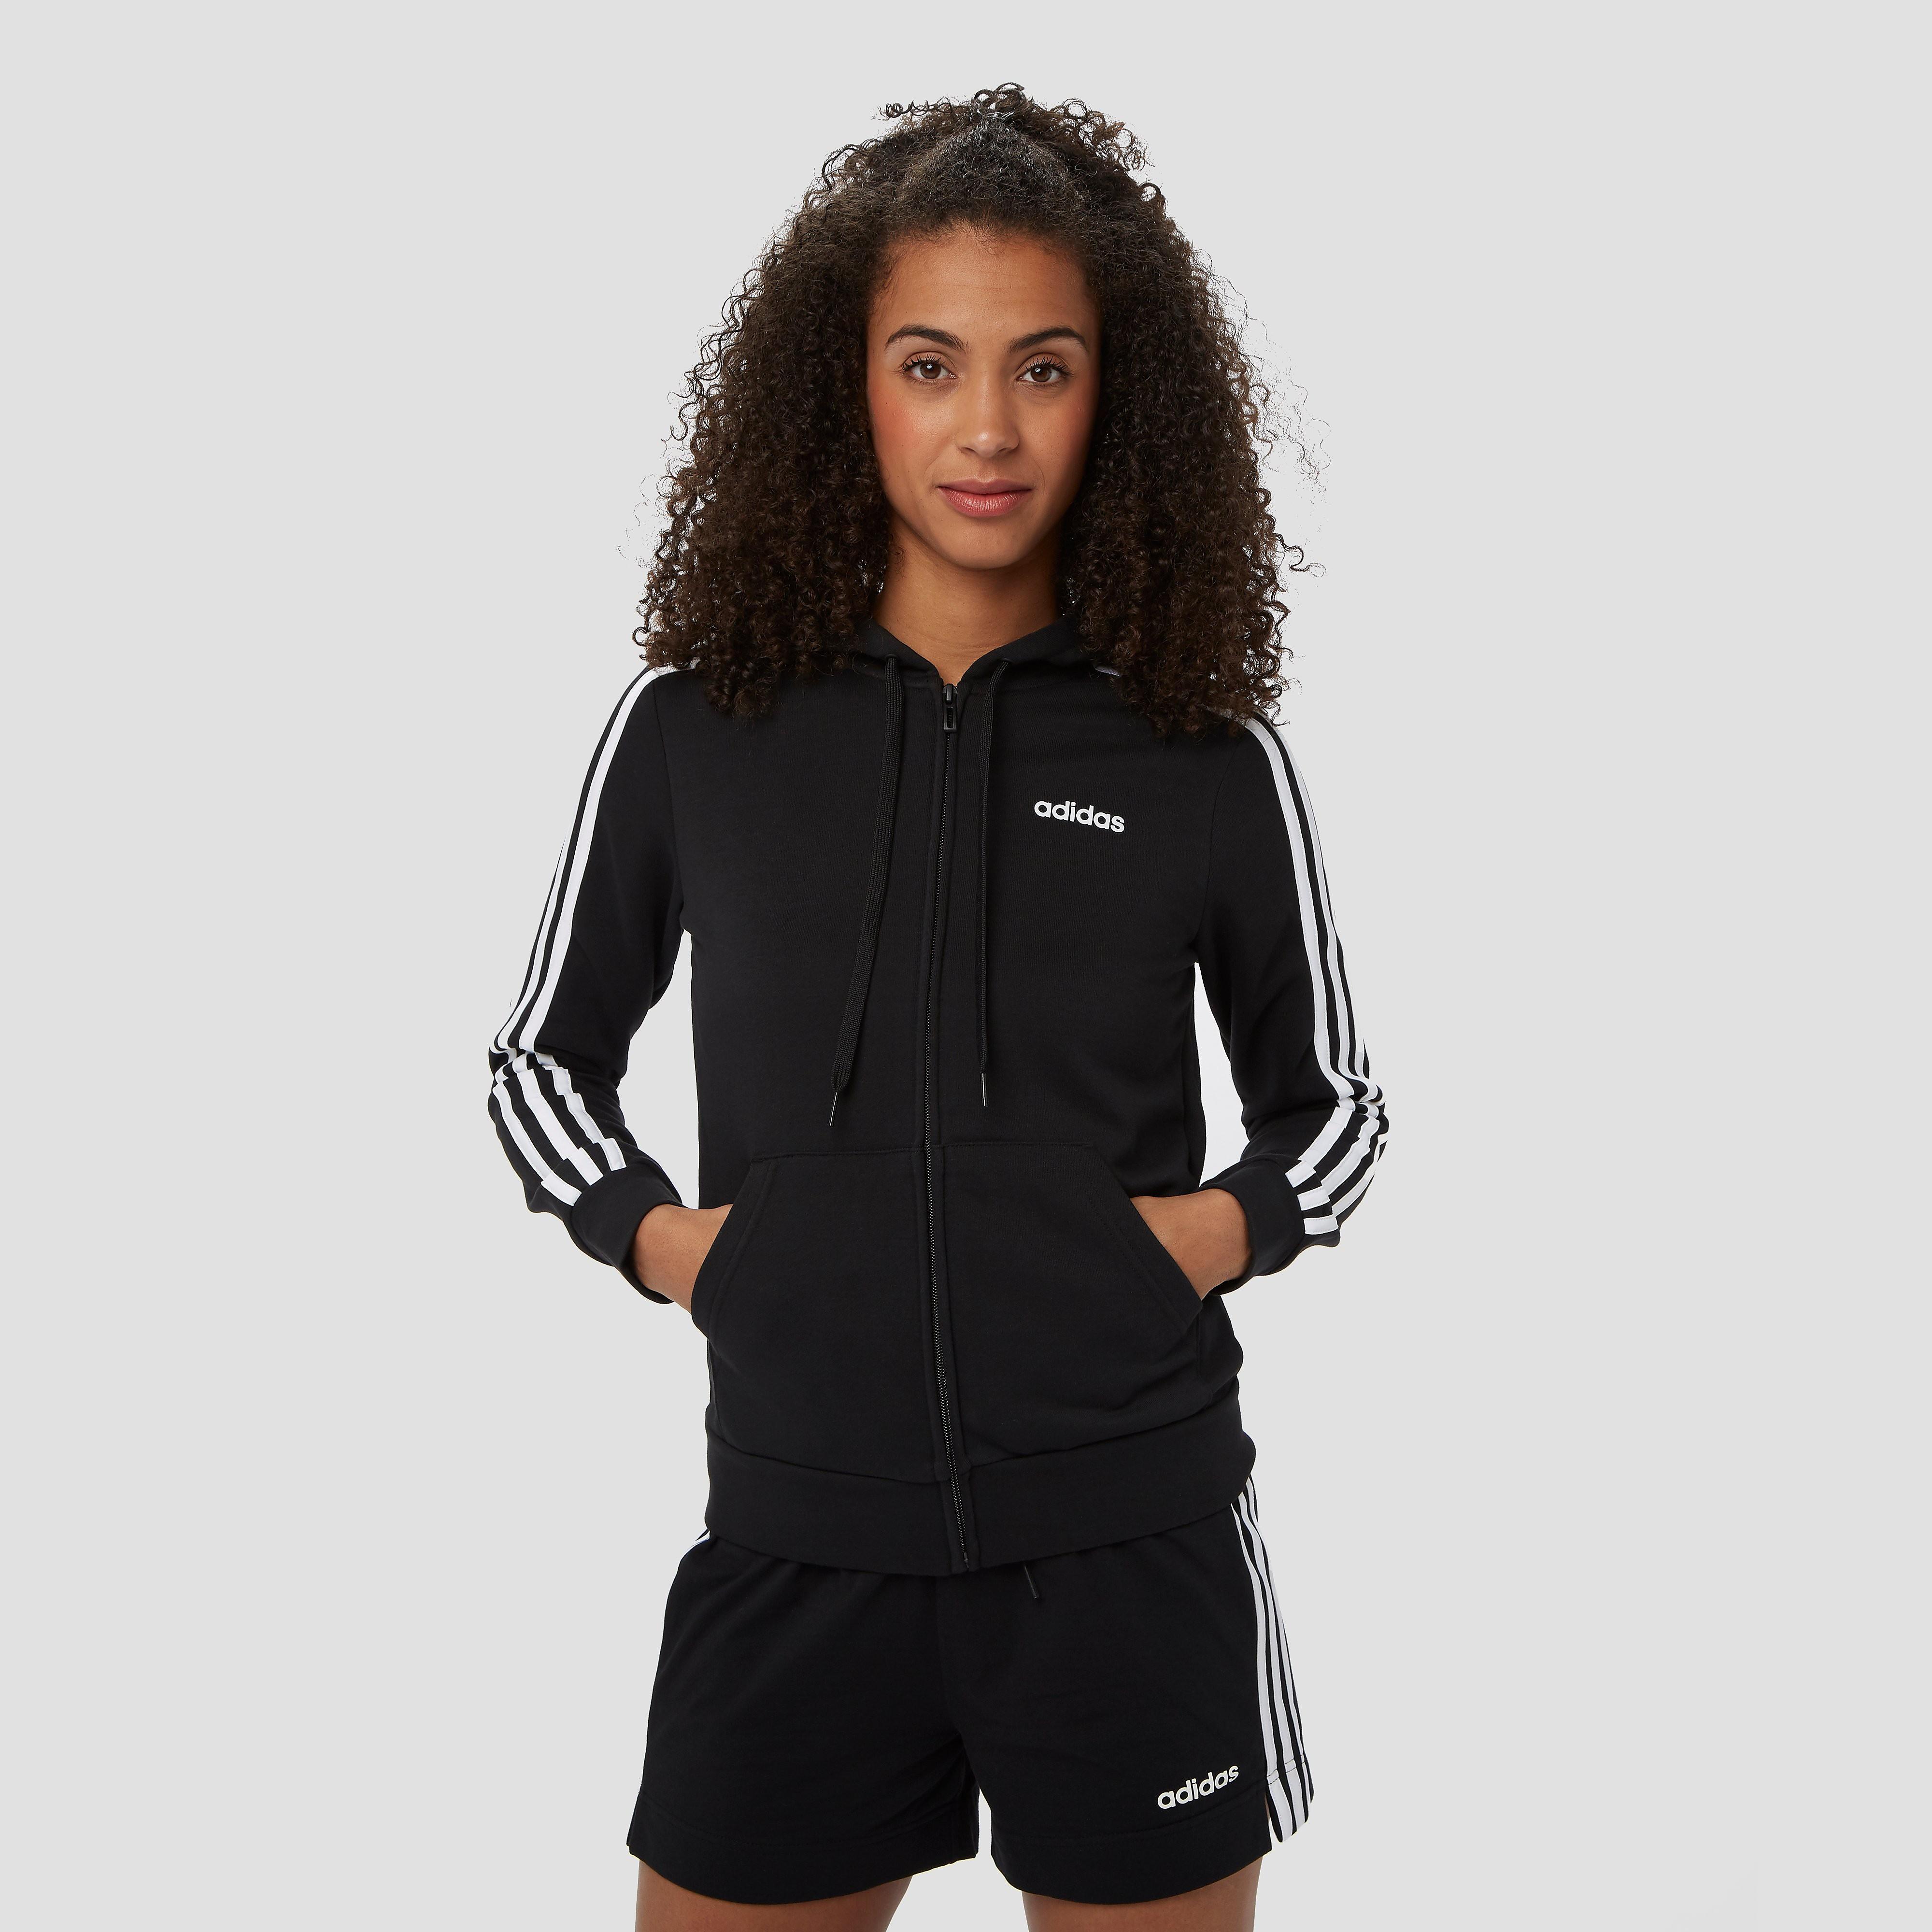 adidas Essentials 3-stripes vest zwart dames Dames thumbnail